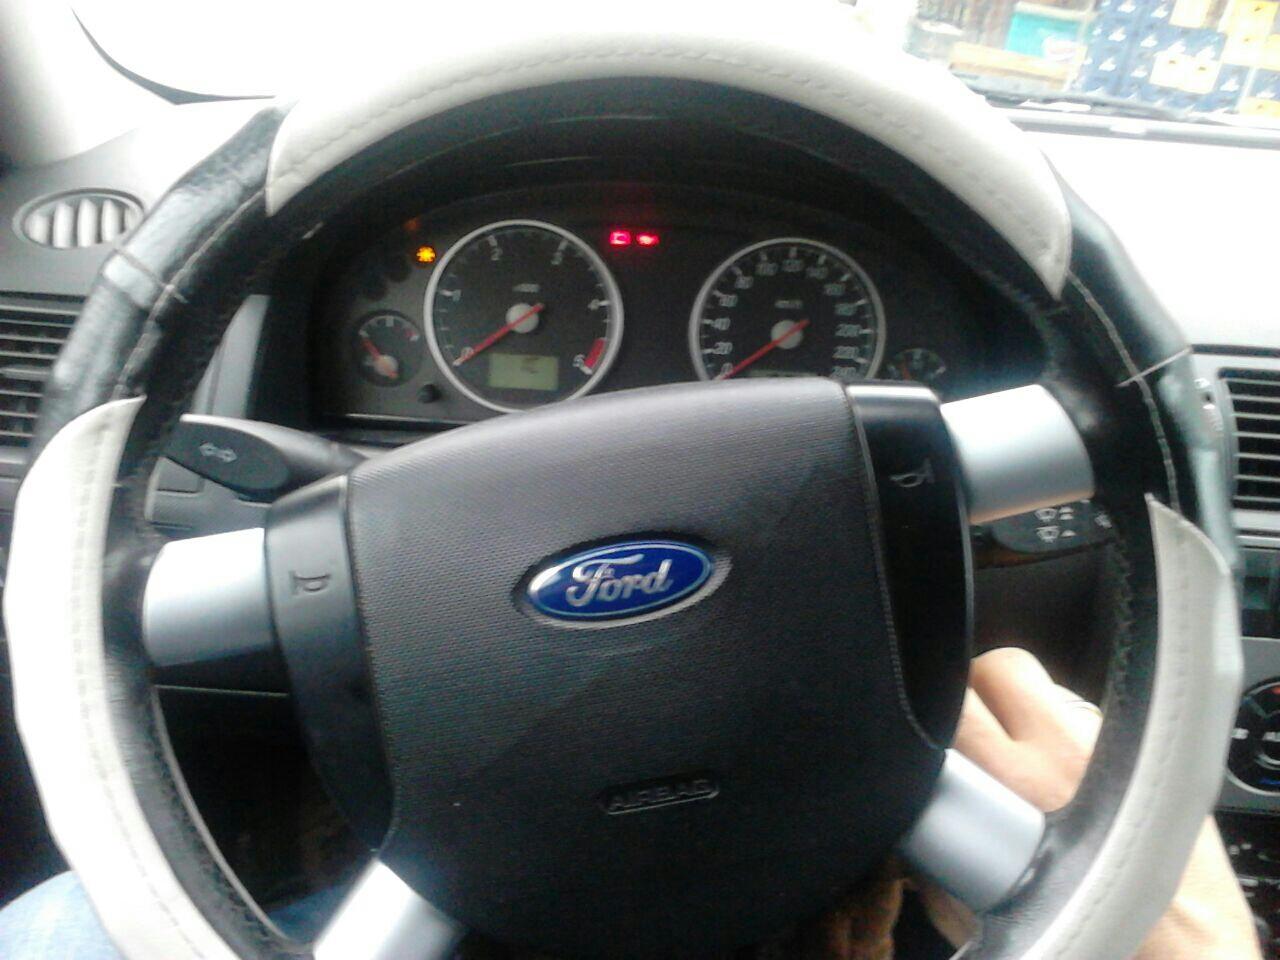 Delovi ford focus tddi tdci kompletan auto u delovima - Re Ford Mondeo 2002 God 2 0 Tddi